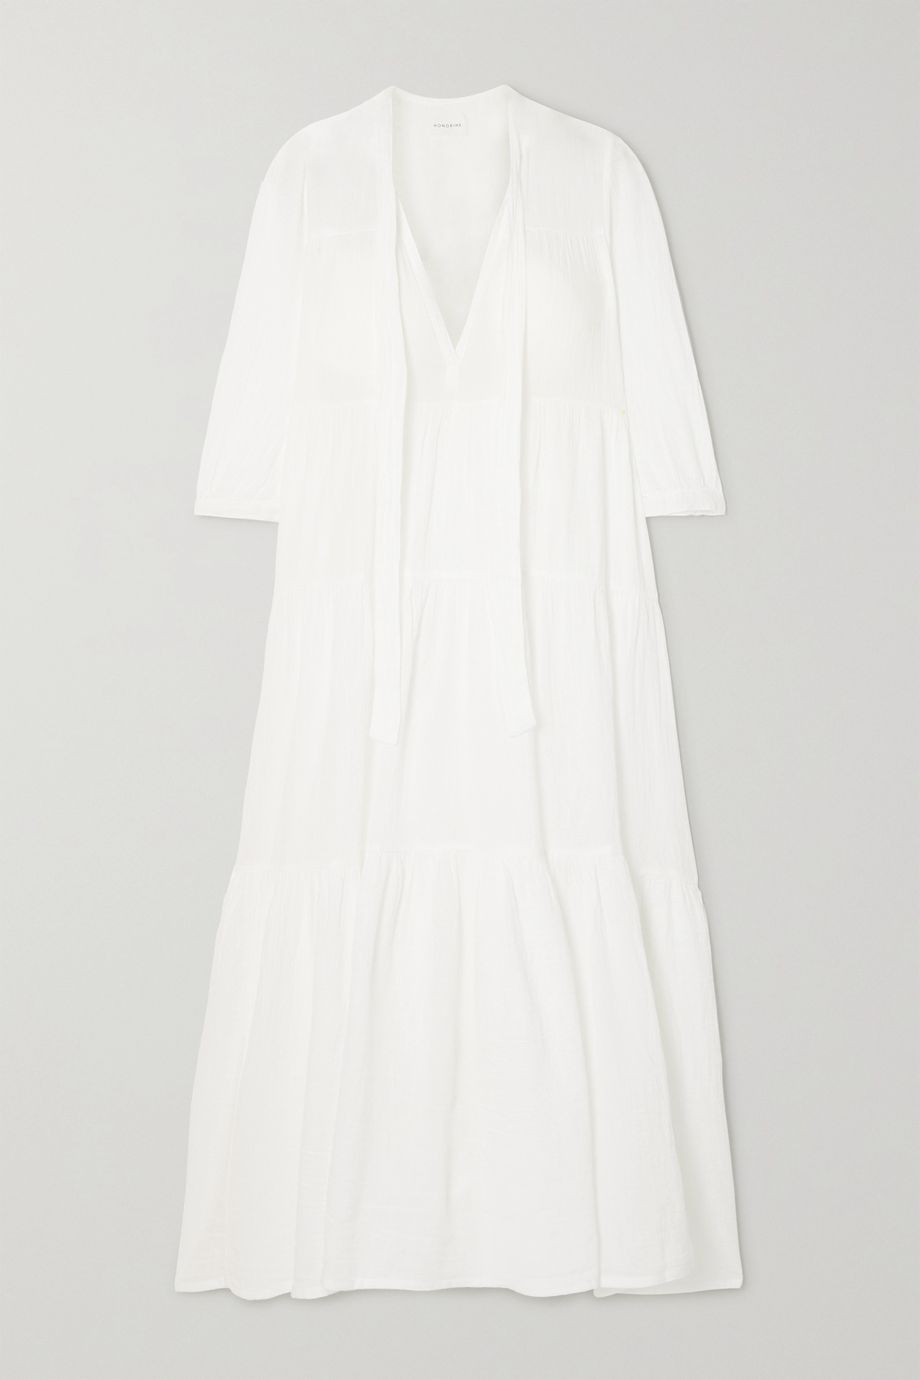 Honorine Giselle pussy-bow tiered crinkled cotton-gauze midi dress